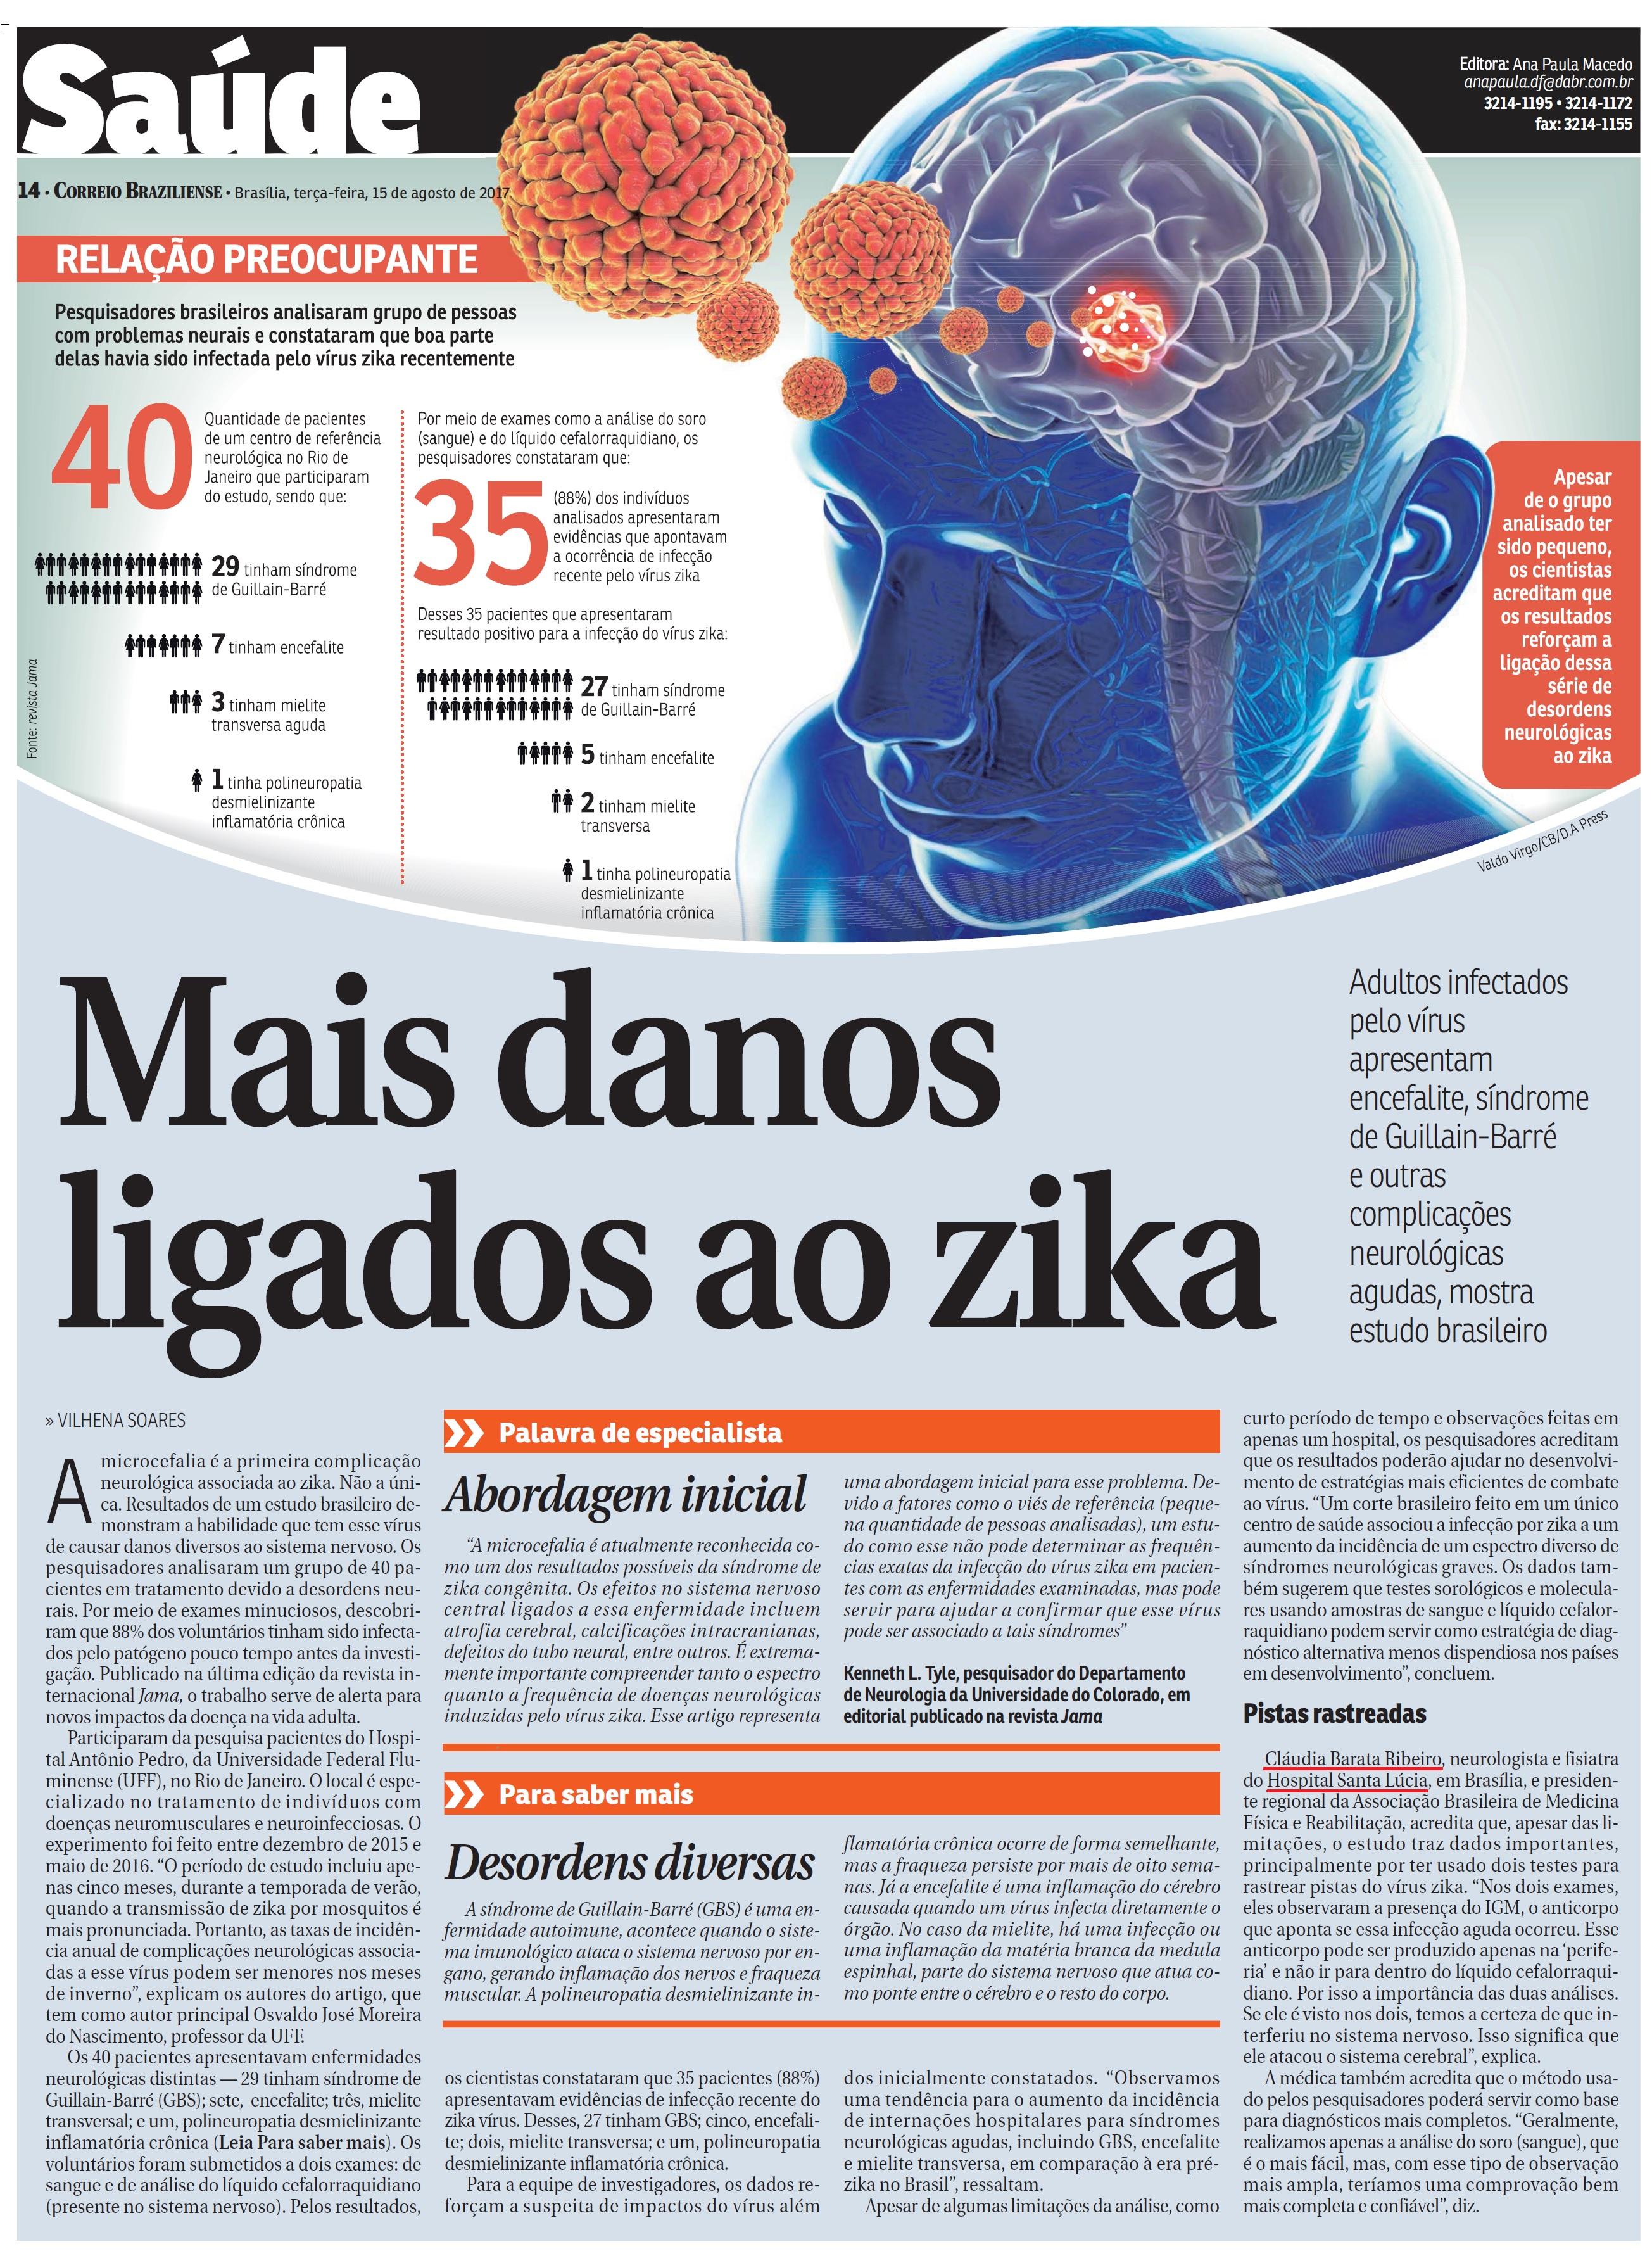 Correio Braziliense - Dra. Cláudia Barata Ribeiro HSL - 15-08-2017